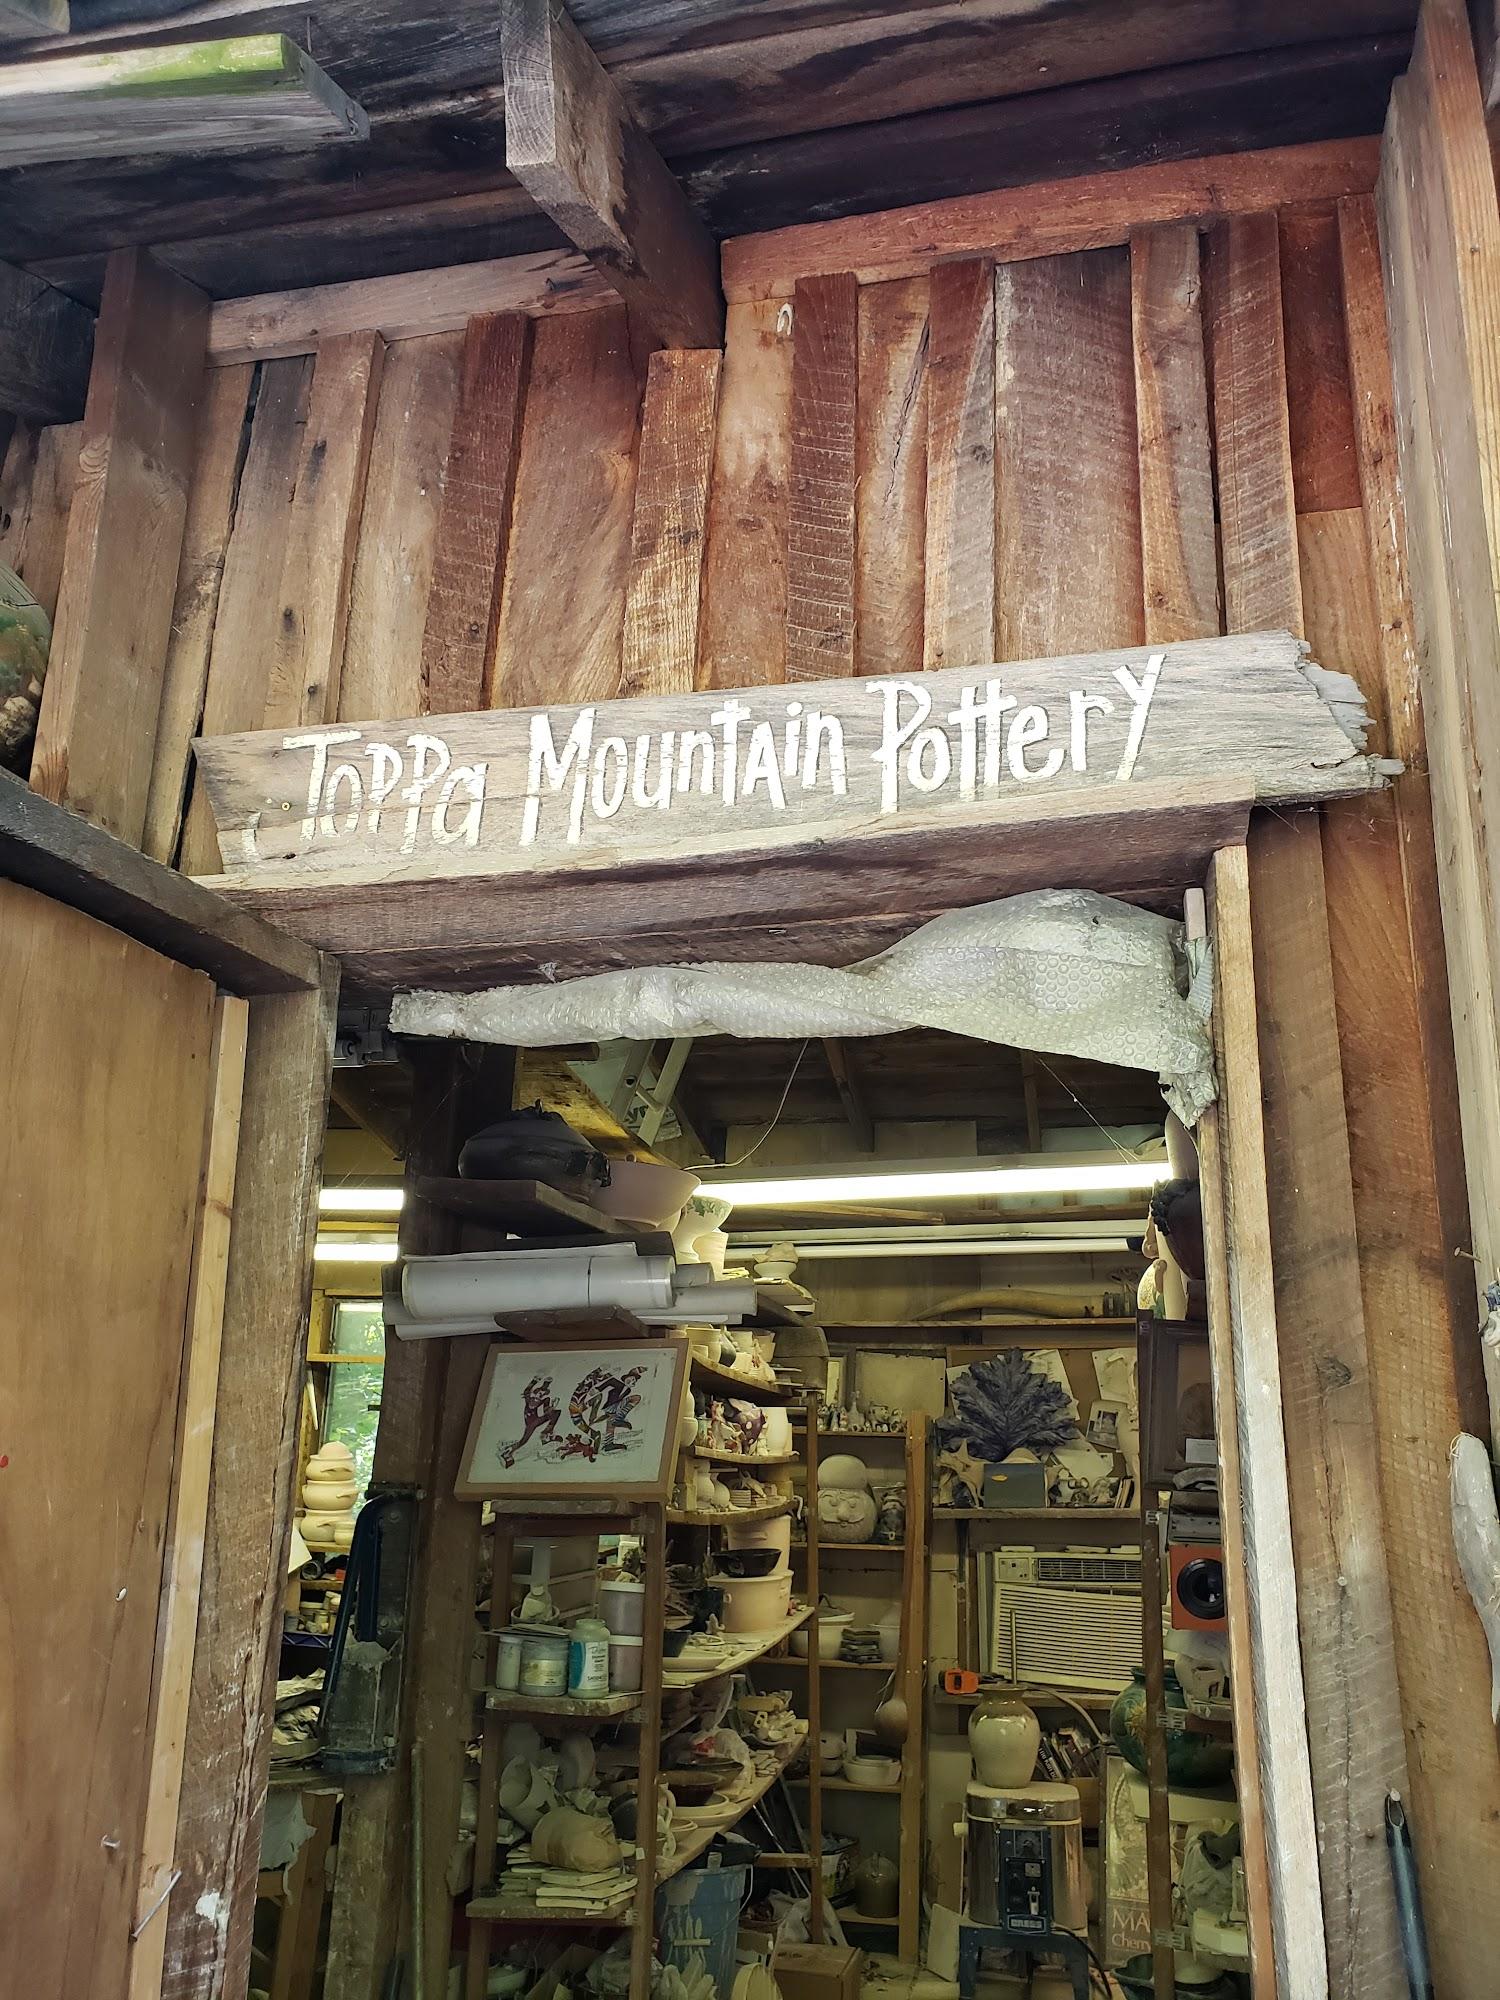 Joppa Mountain Pottery 1479 Joppa Mountain Rd, Rutledge